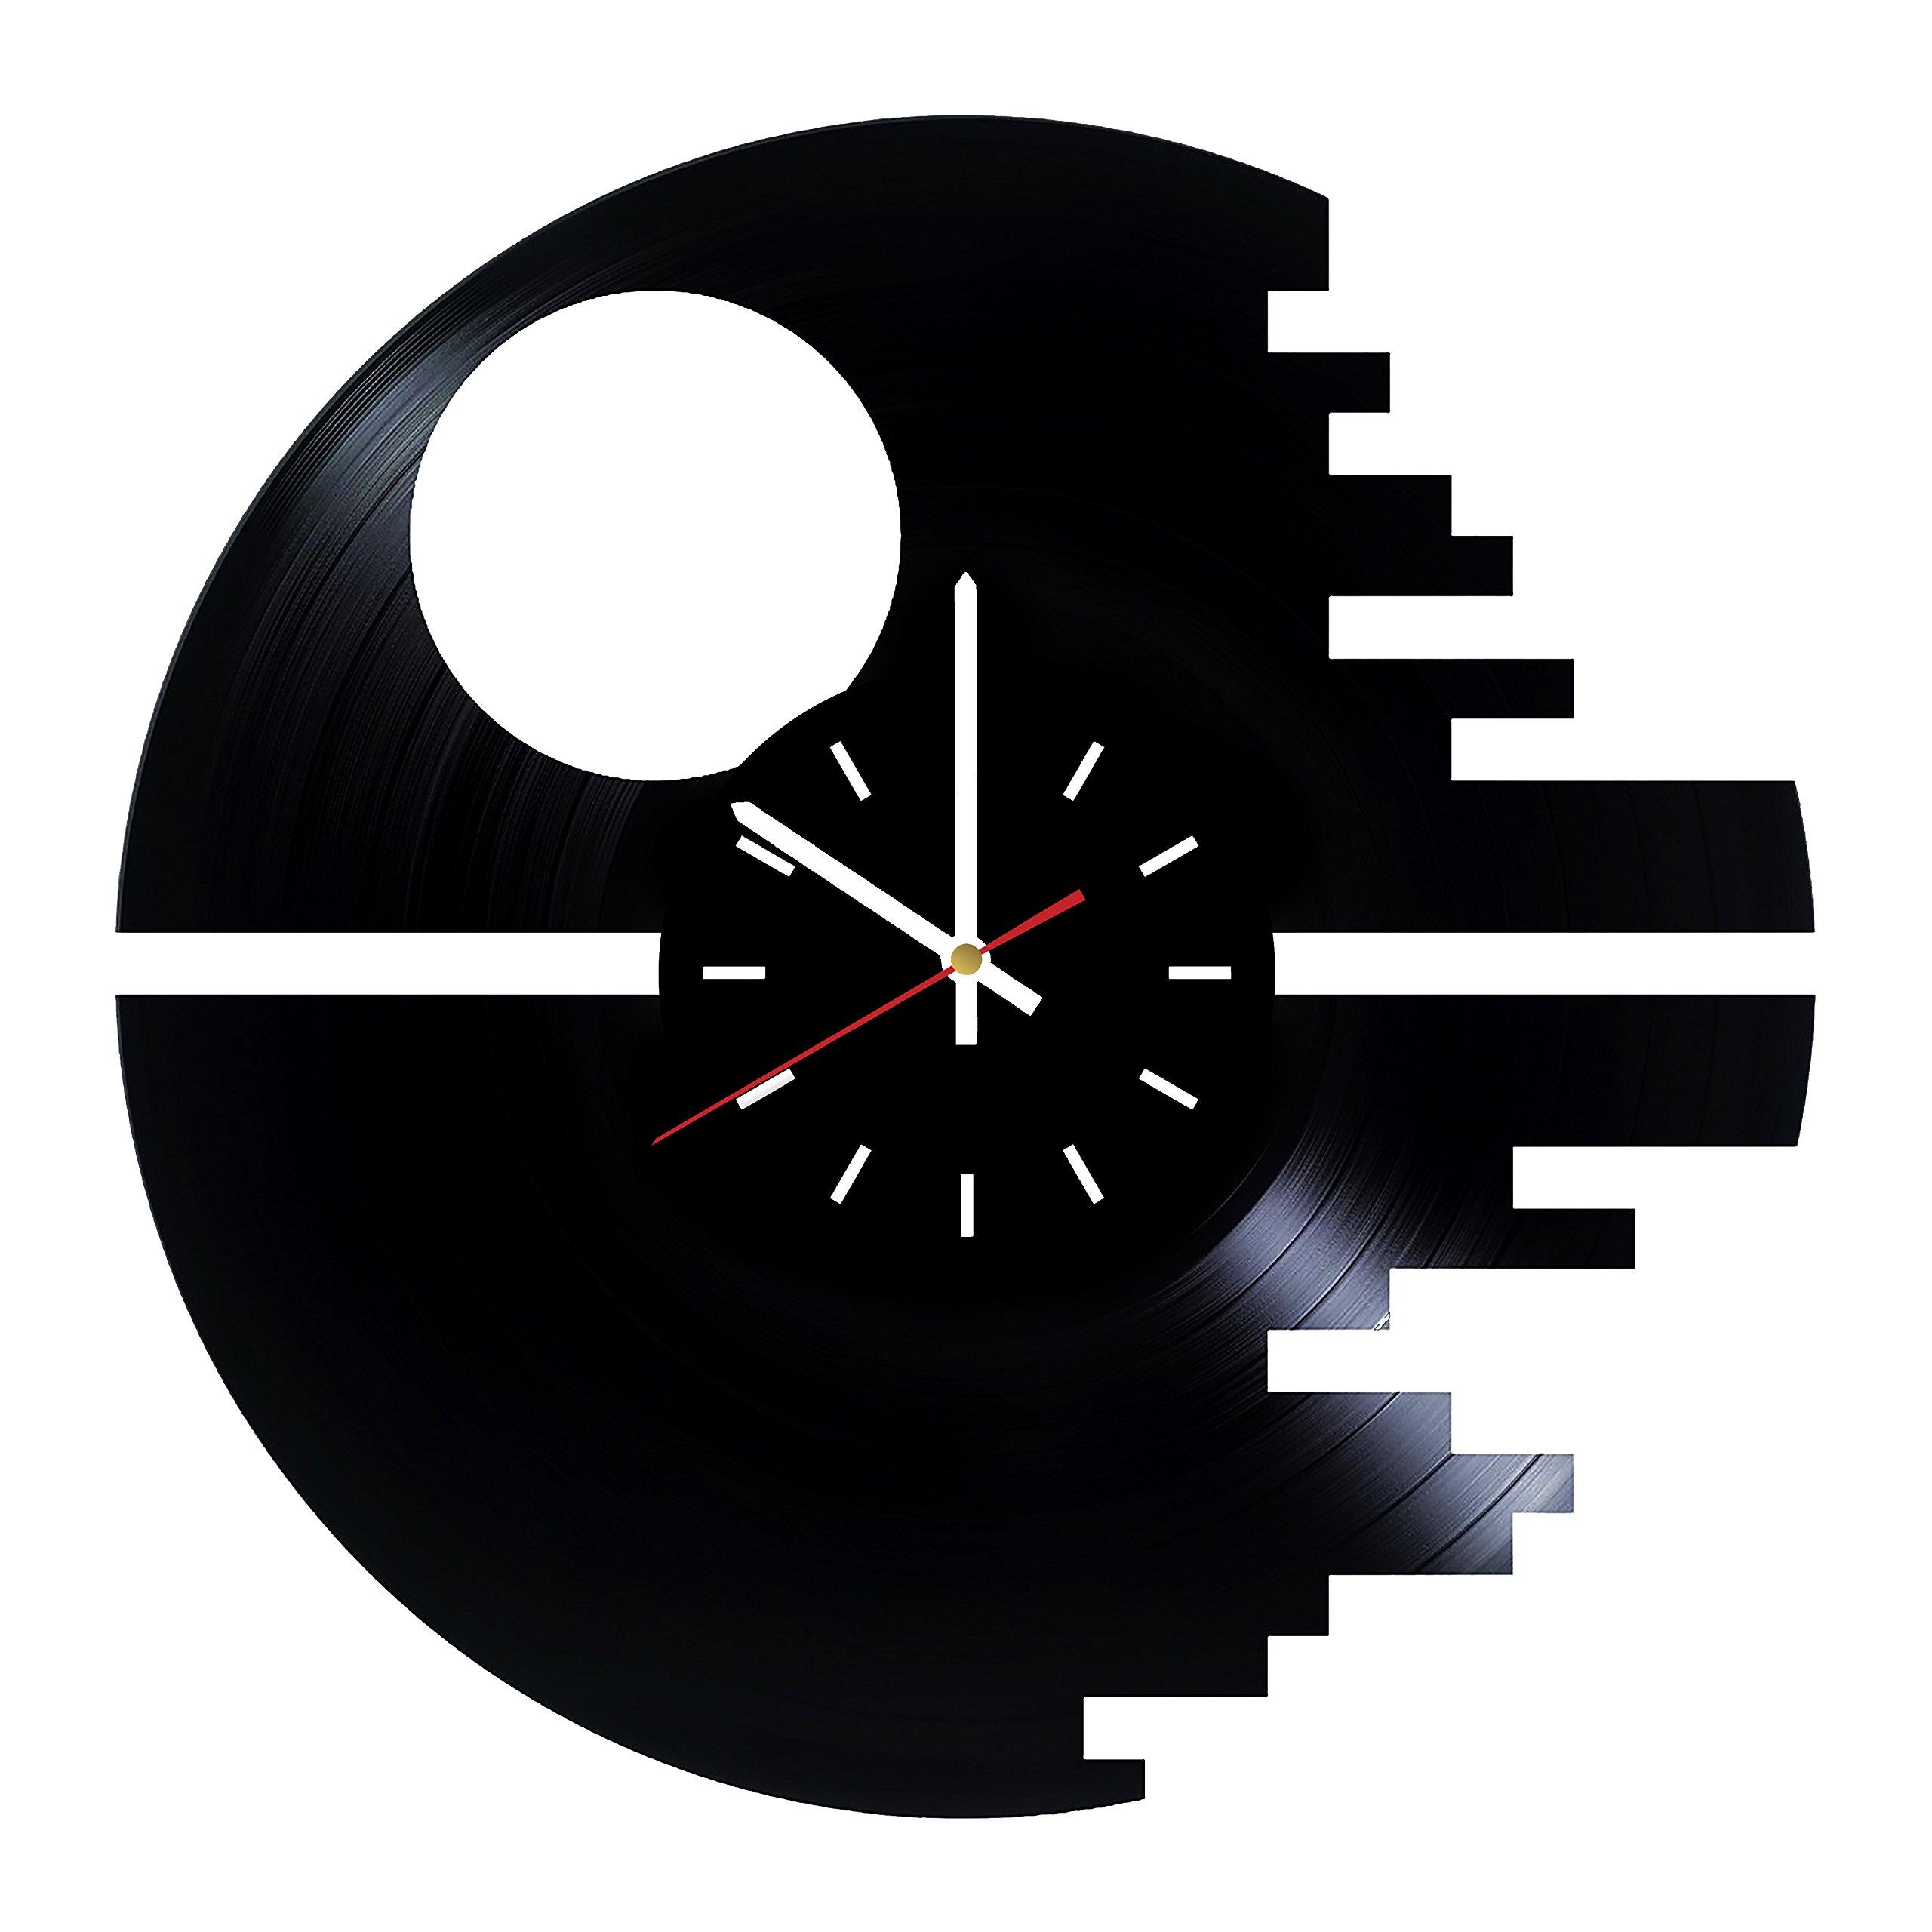 Everyday Arts Death Star Emblem Design Vinyl Record Wall Clock - Get Unique Bedroom or Garage Wall Decor - Gift Ideas for Friends, Brother - Darth Vader Unique Modern Art